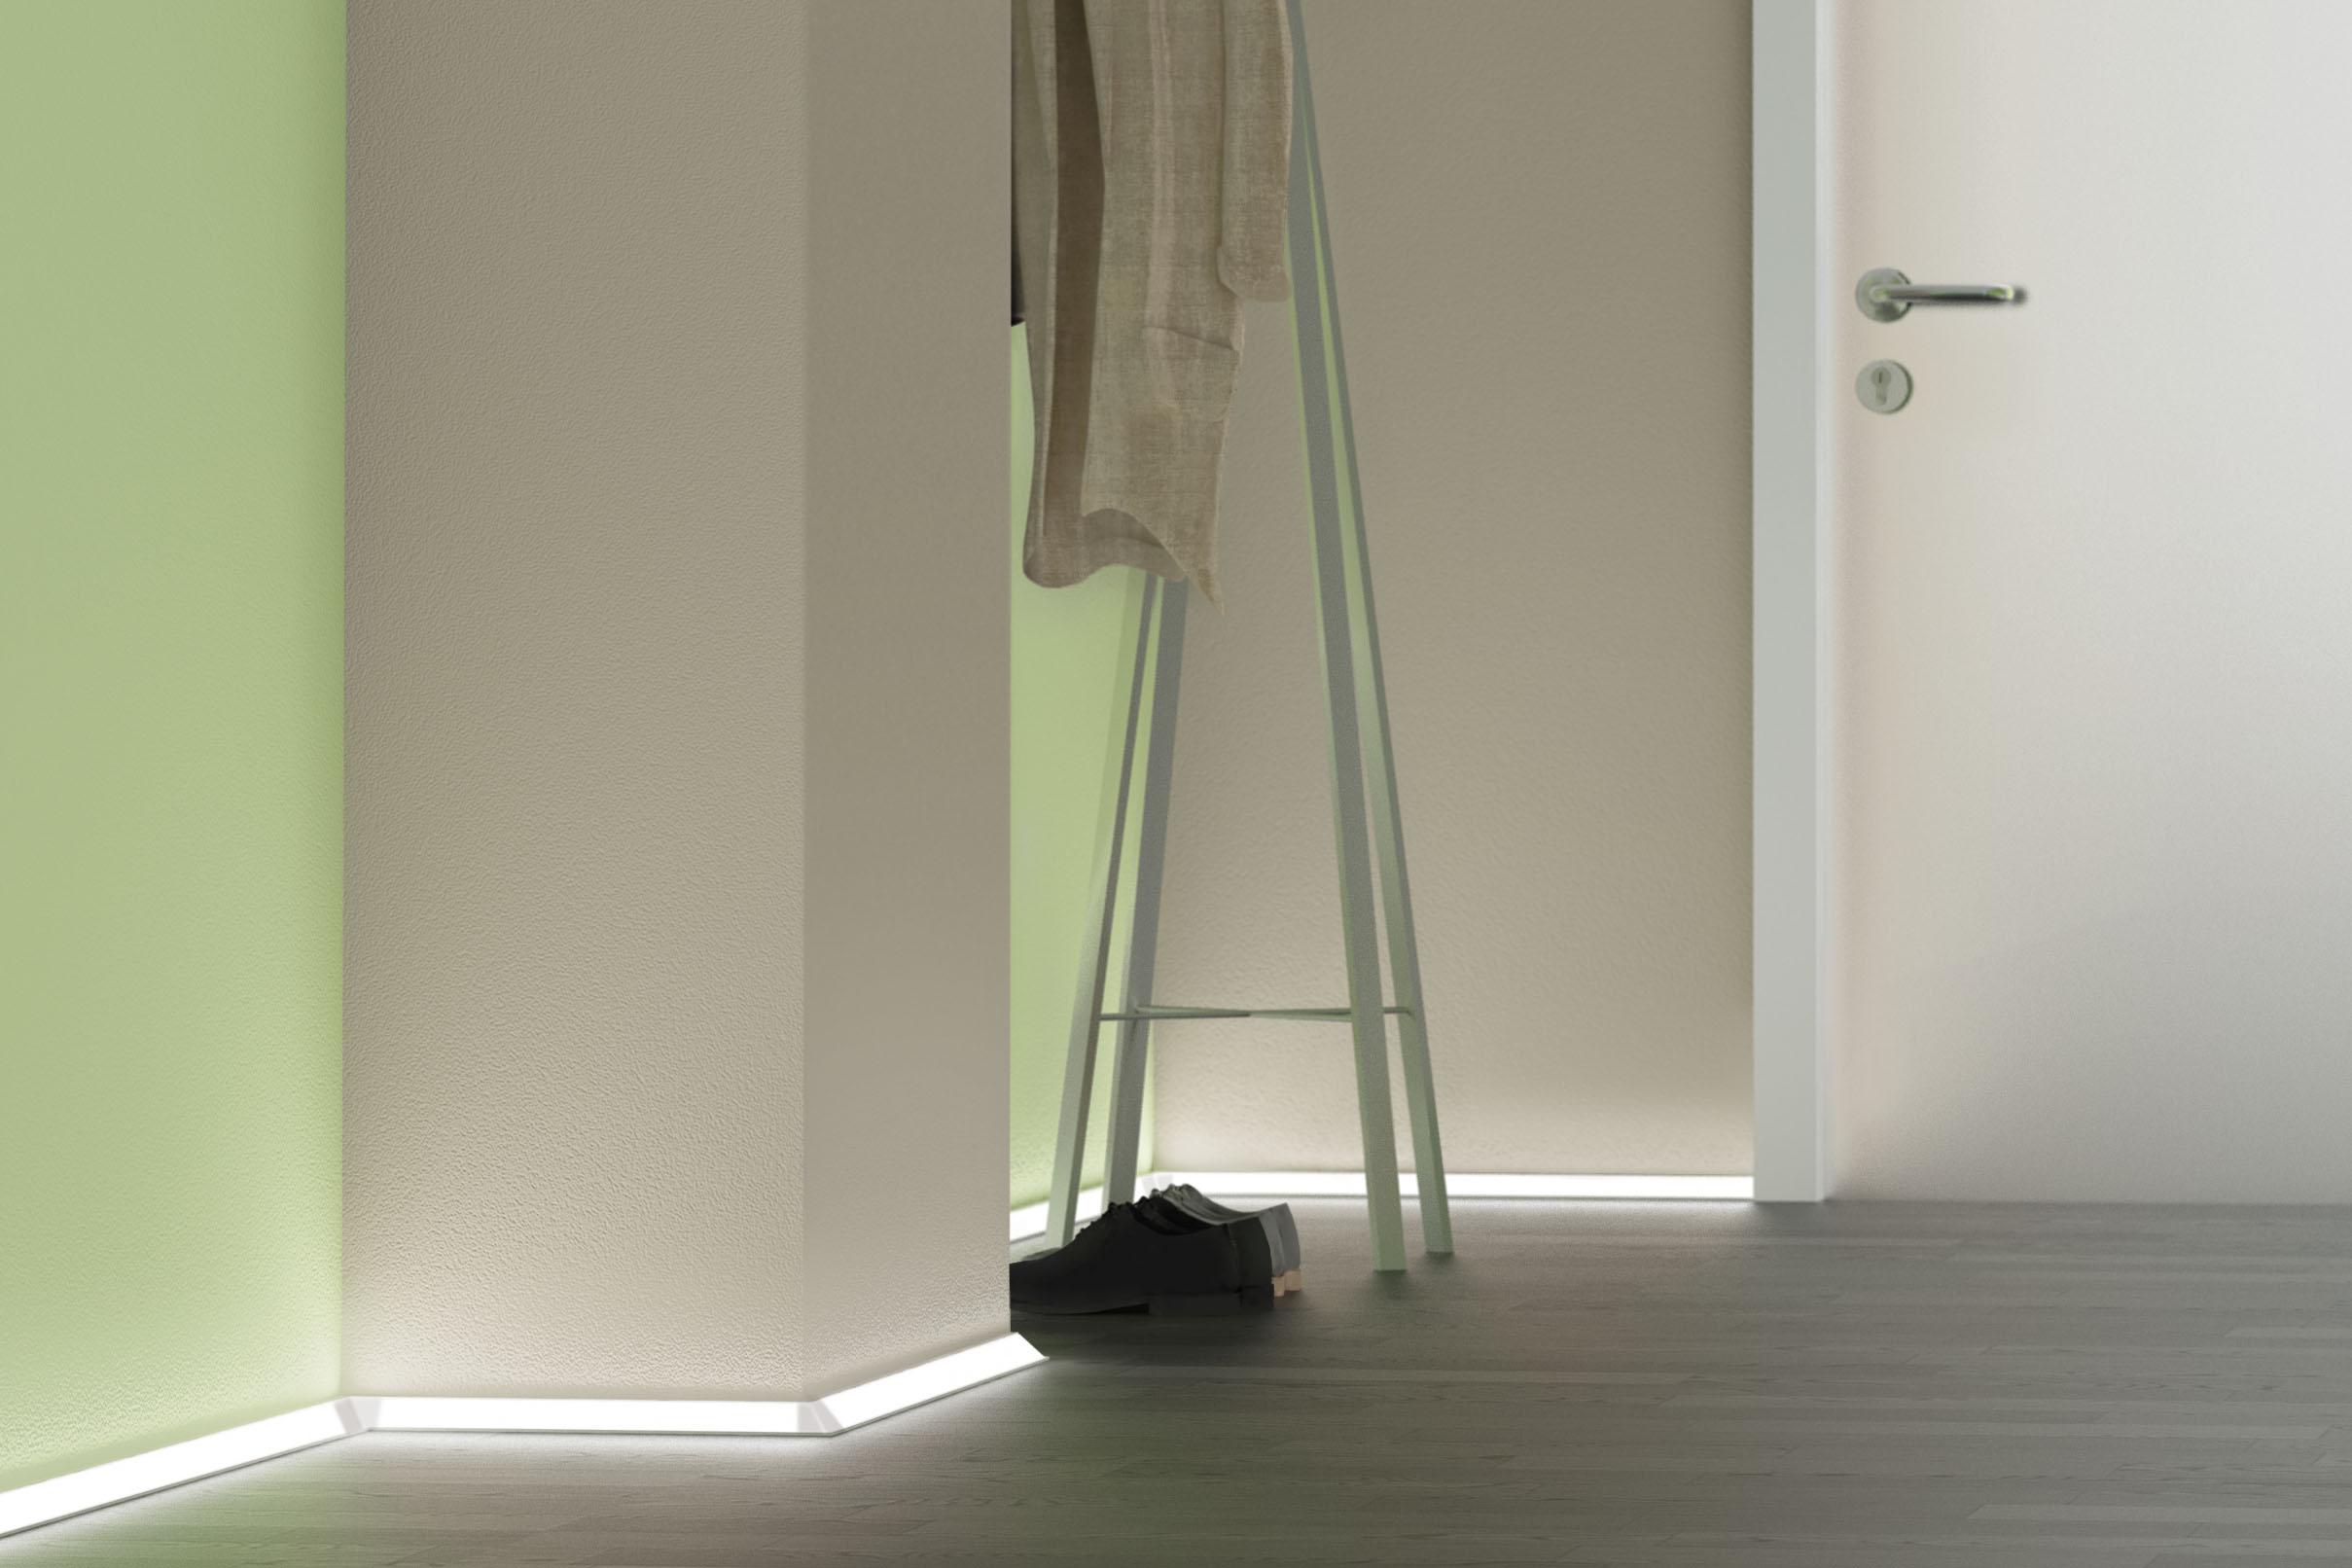 led-profil-interior-006